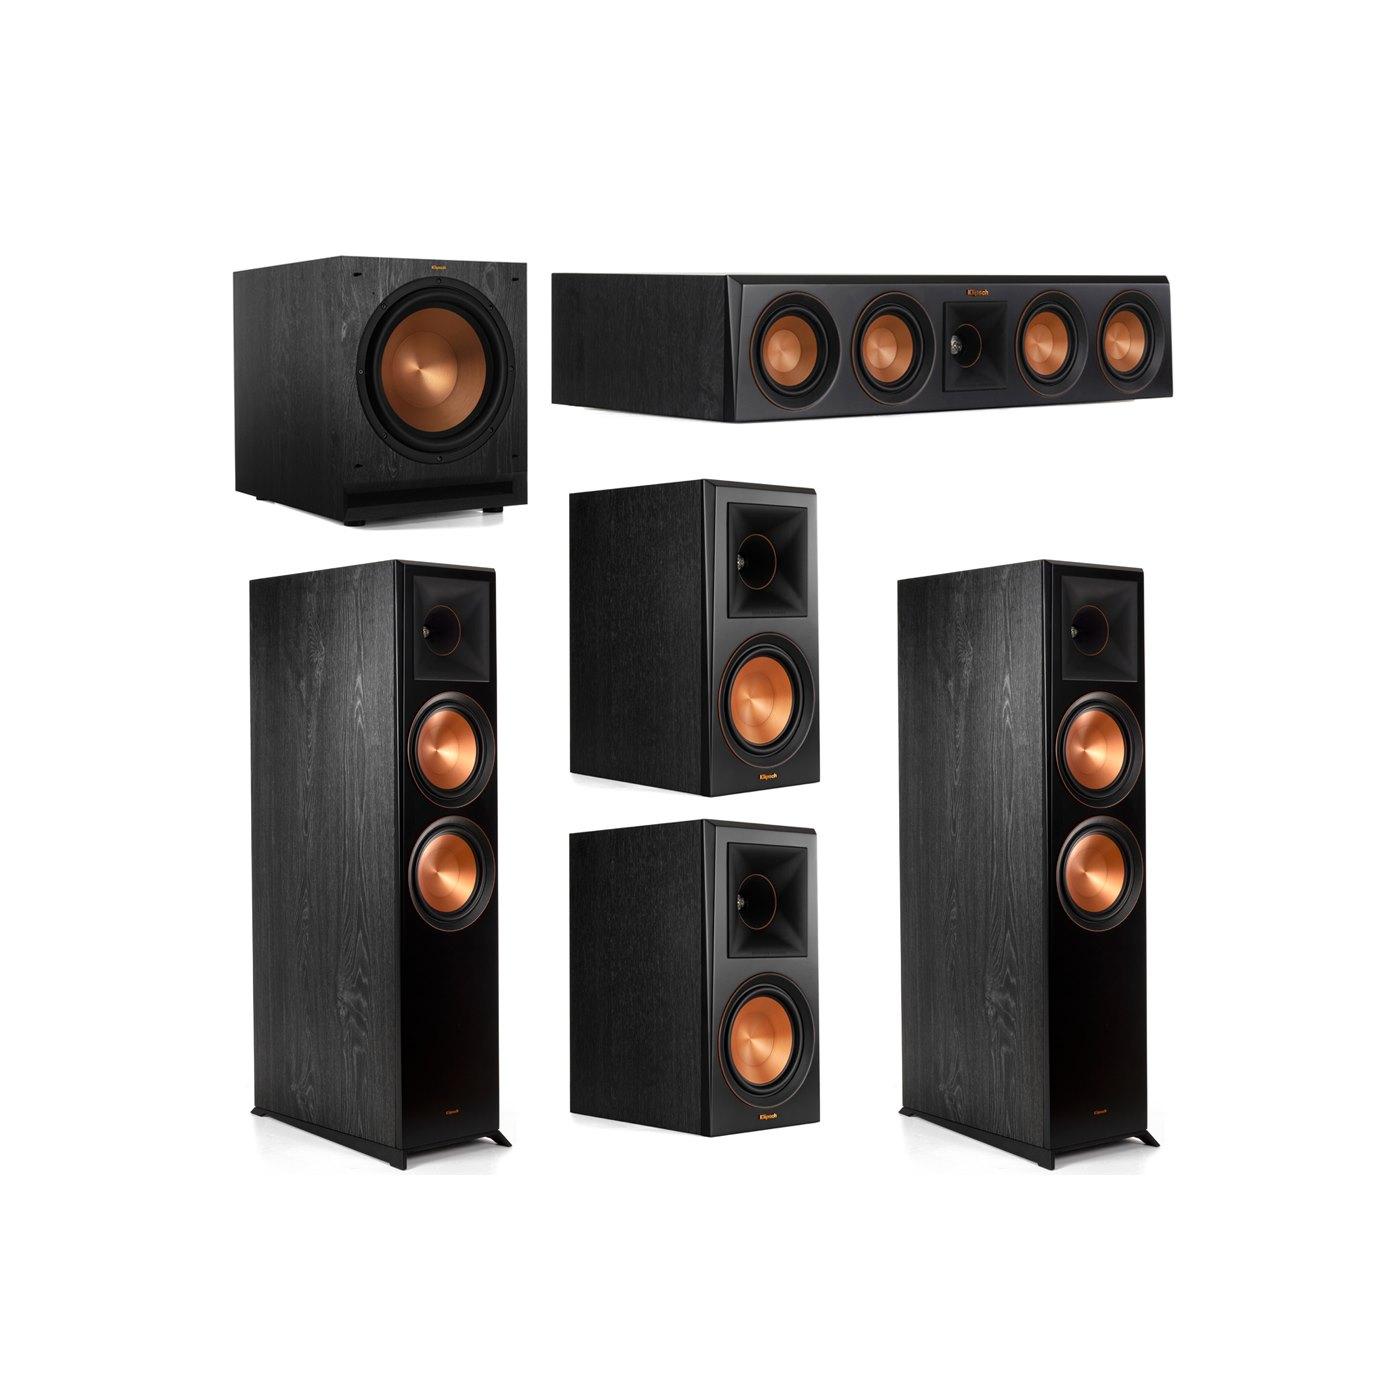 Klipsch 5.1 System with 2 RP-8000F Floorstanding Speakers, 1 Klipsch RP-404C Center Speaker, 2 Klipsch RP-600M Surround Speakers, 1 Klipsch SPL-120 Subwoofer